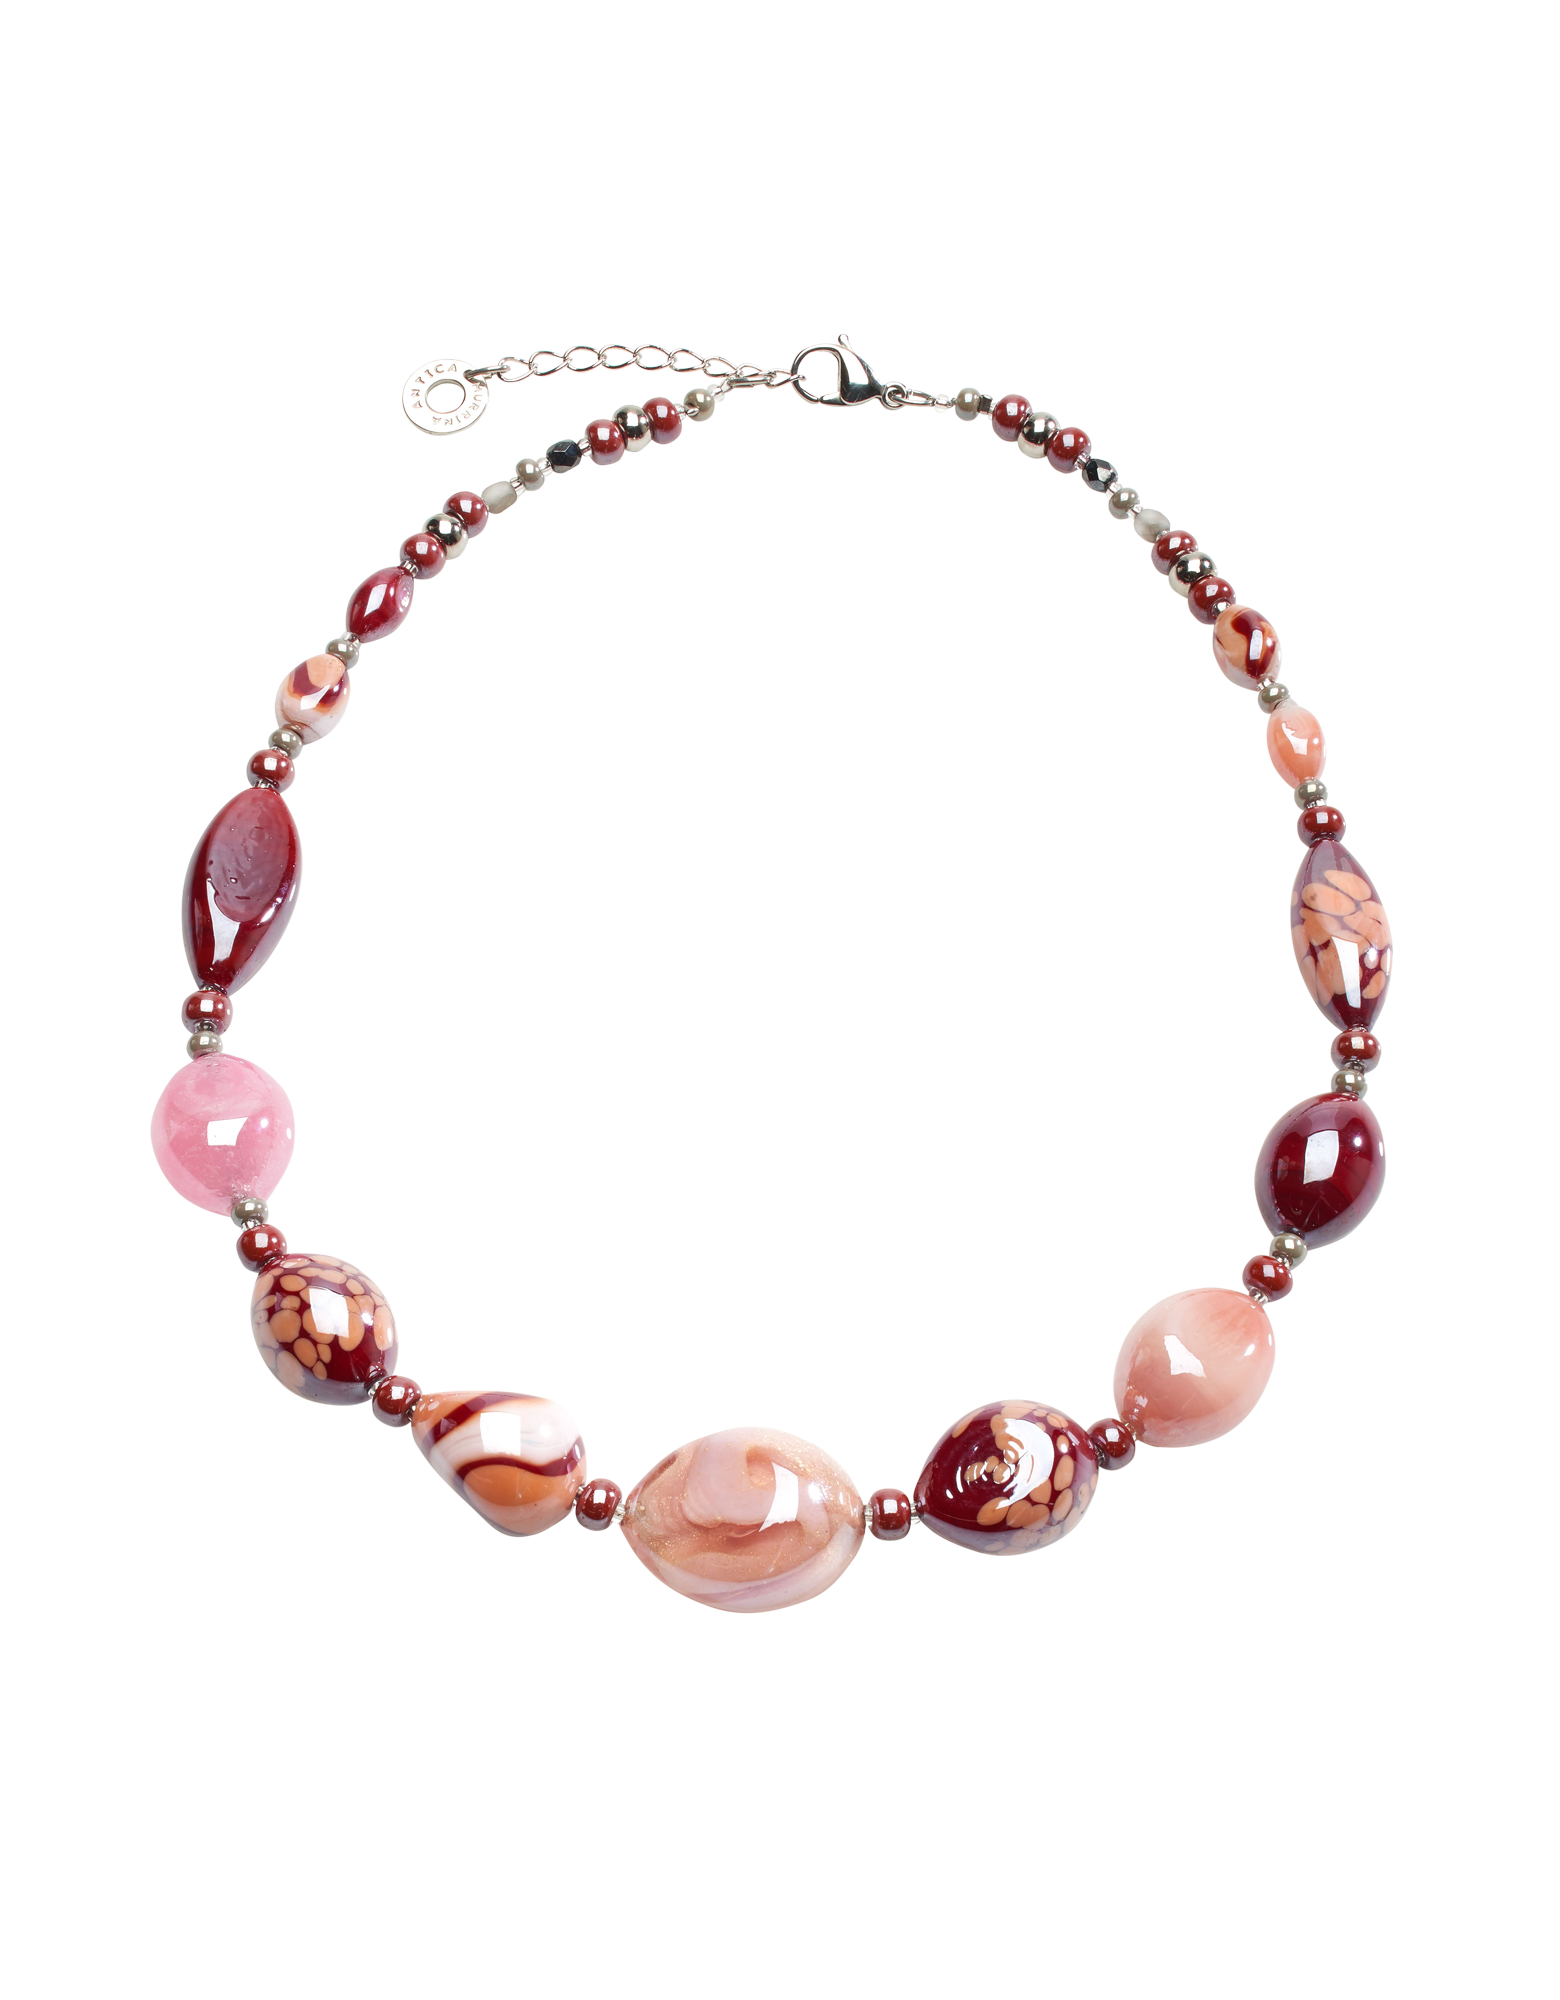 Image of Crevan Necklace